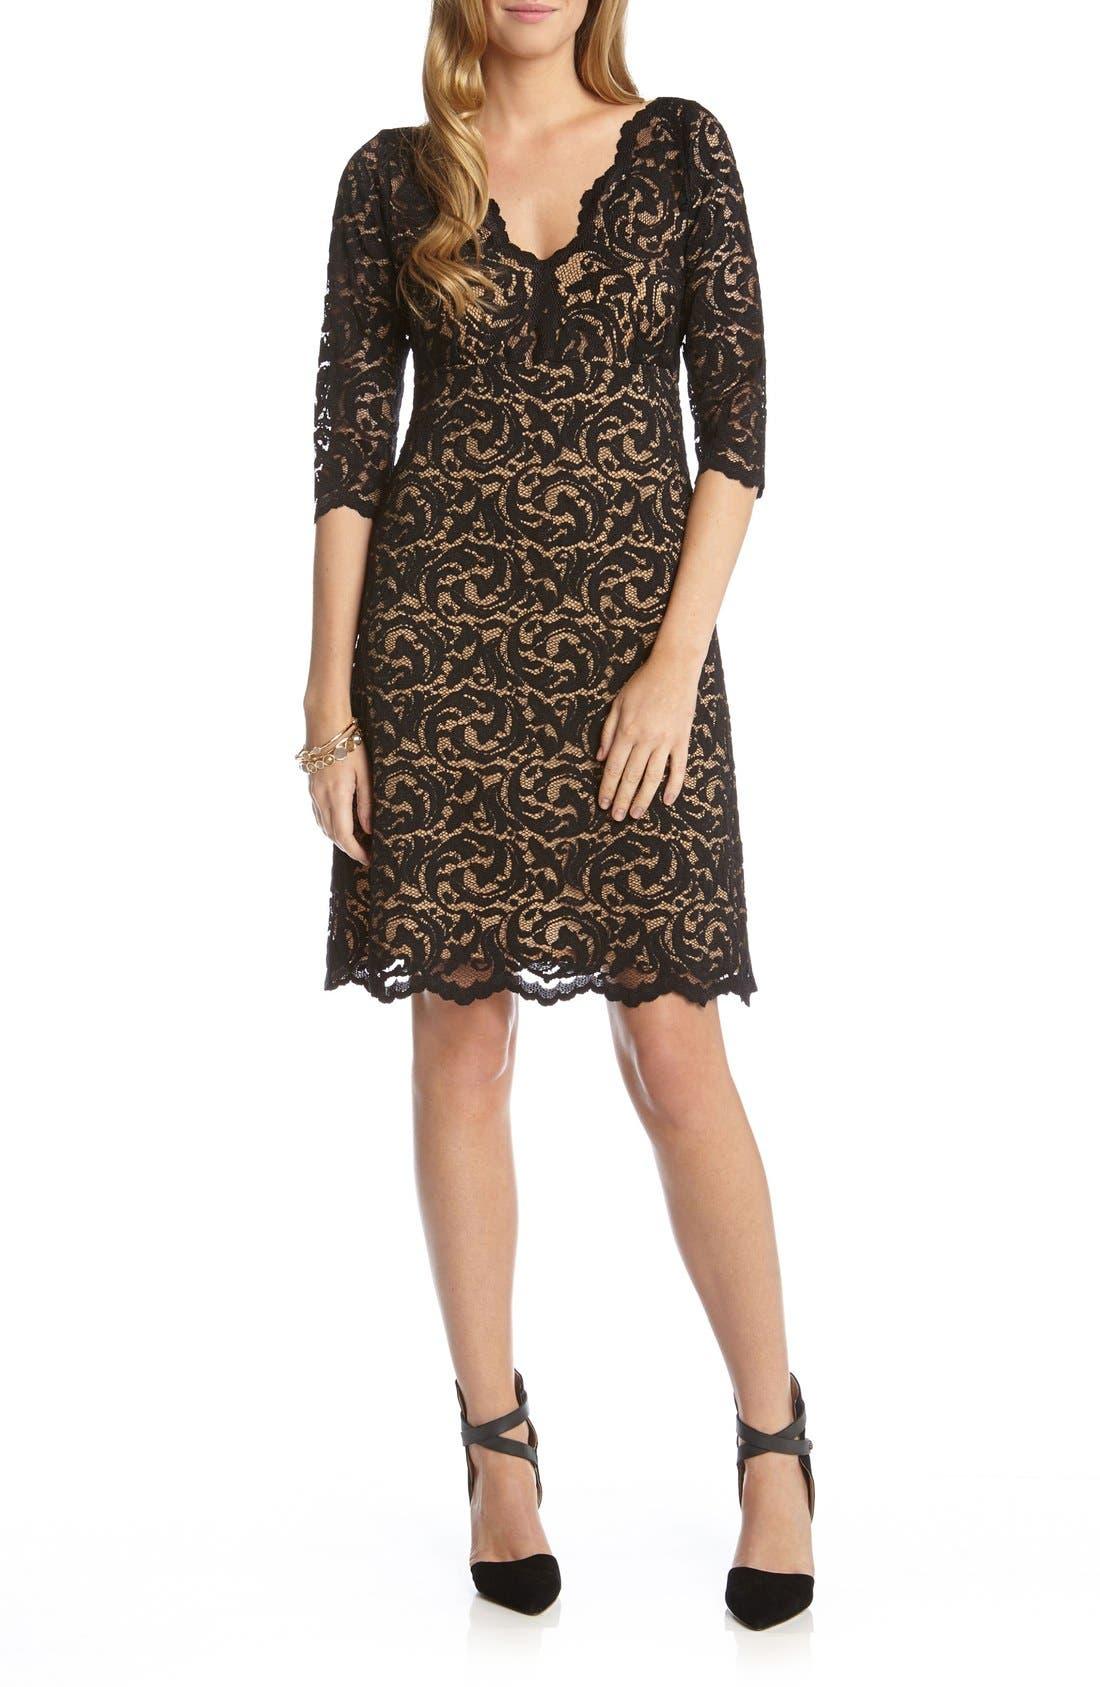 Scalloped Lace V-Neck Dress,                         Main,                         color, Black/ Nude